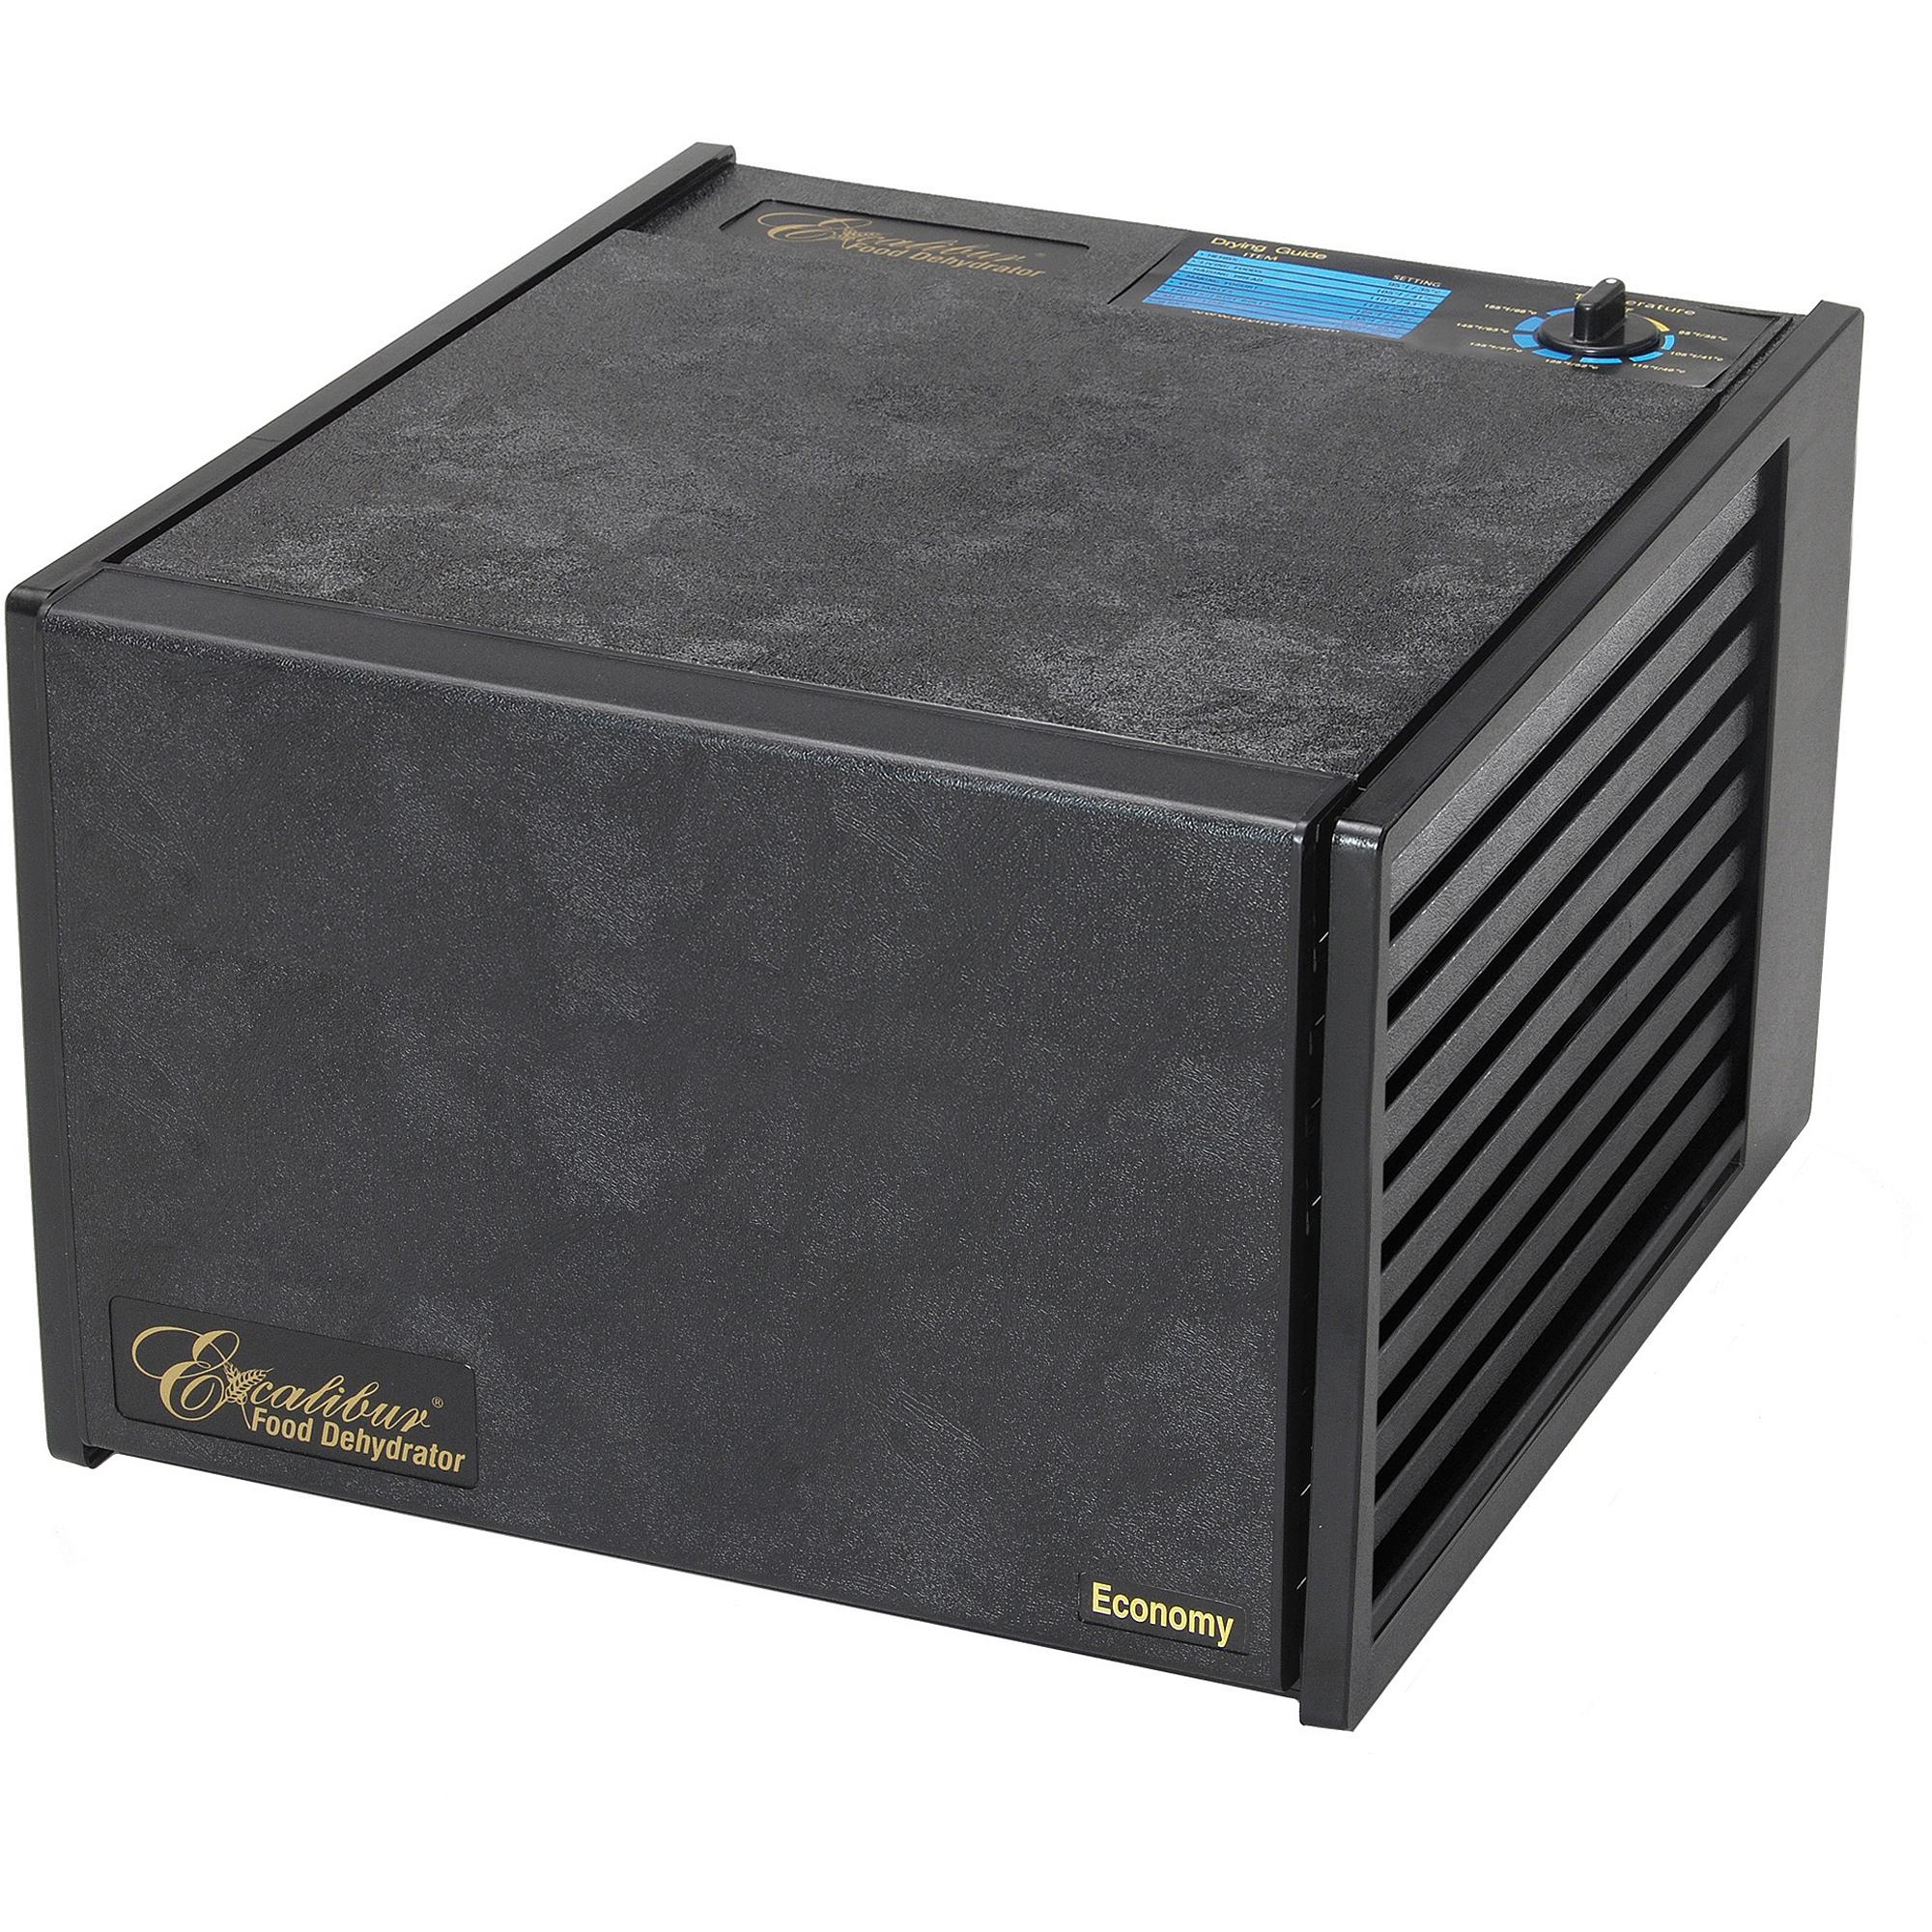 Excalibur 9-Tray Dehydrator, Black